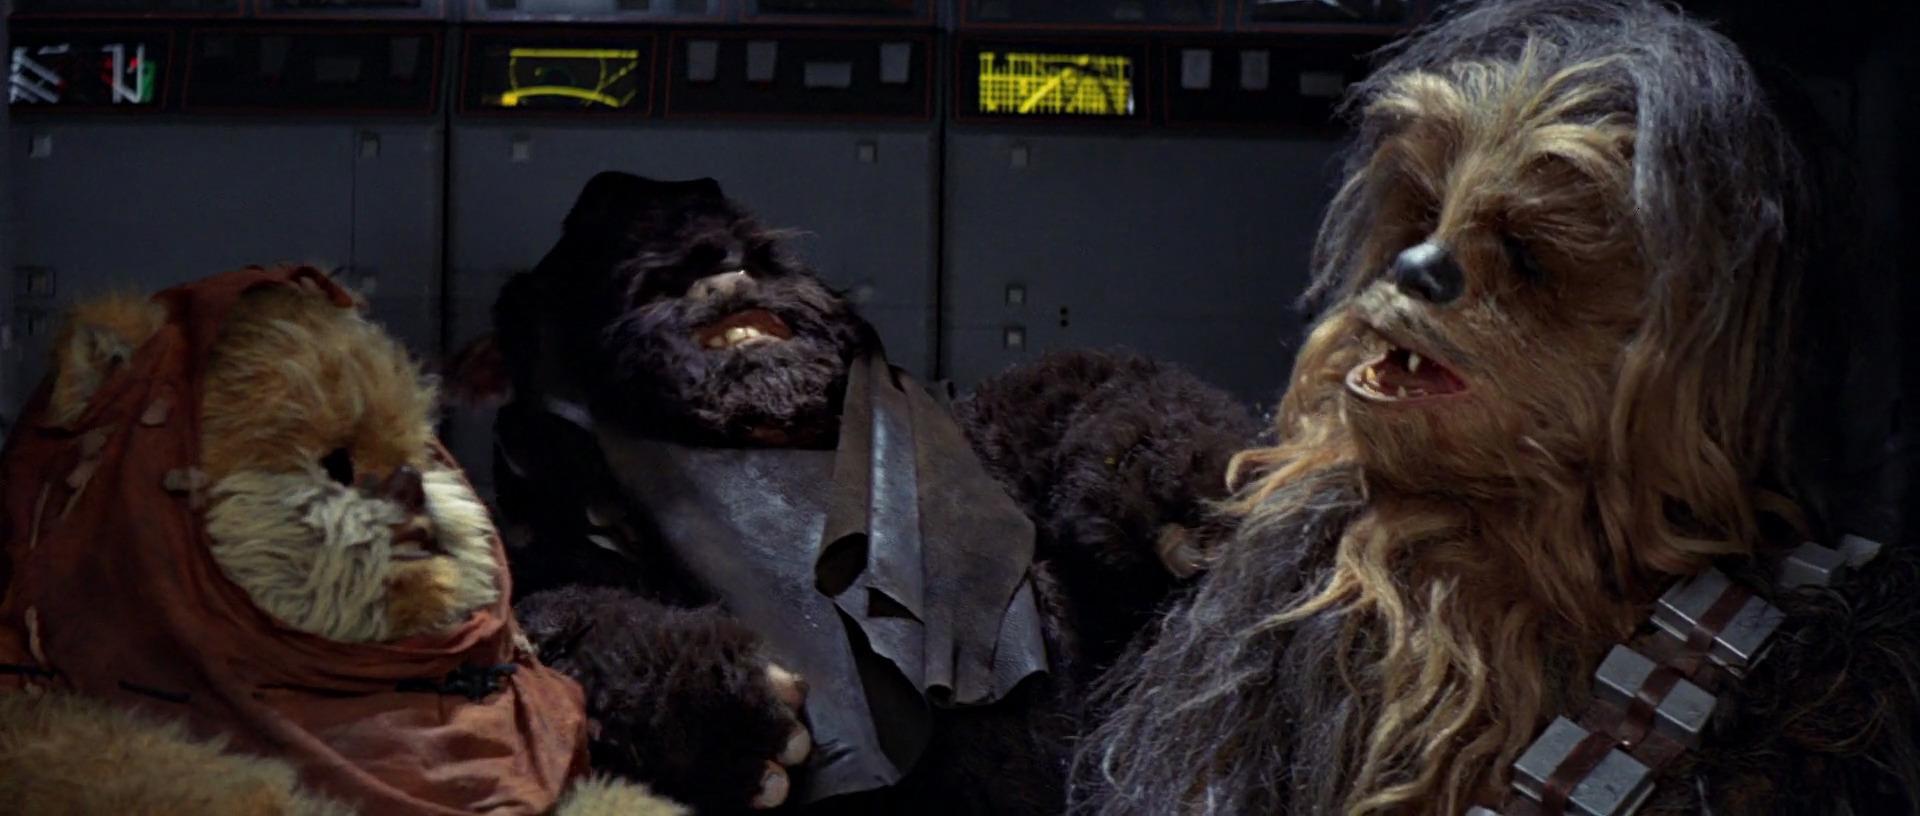 Ewoks and Wookie